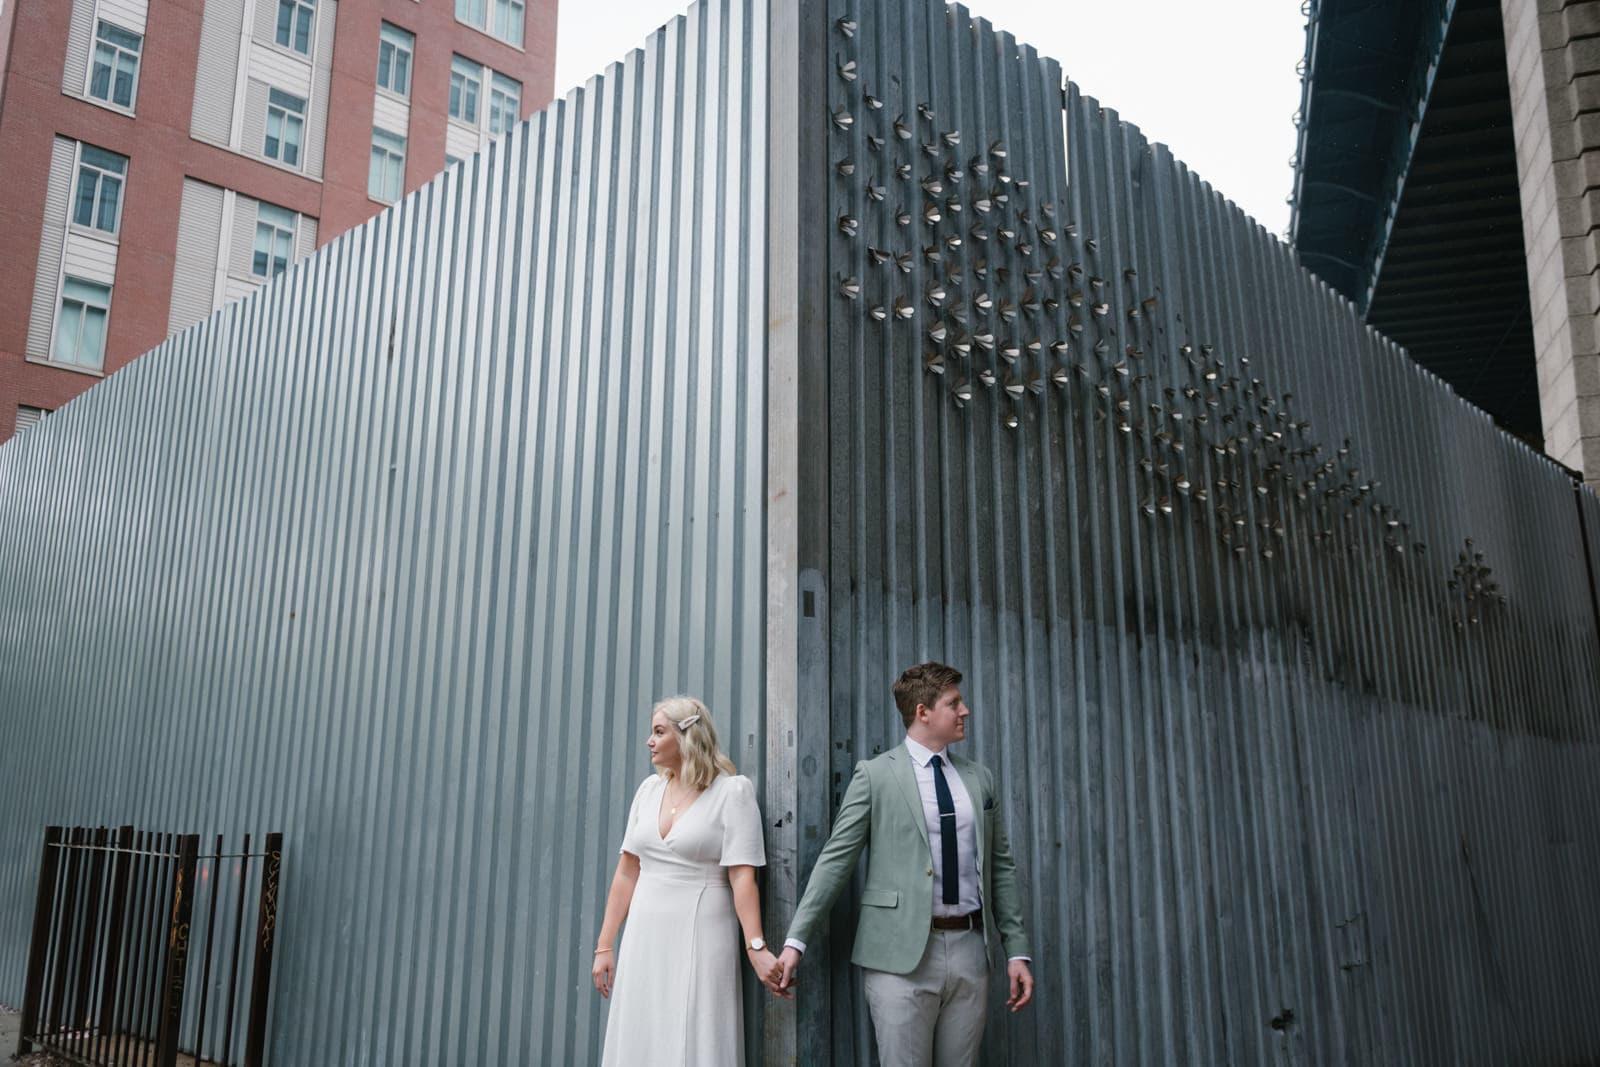 Brooklyn Bridge Park elopement and rainy day wedding in NYC. Photos by Brooklyn wedding photographer Everly Studios, www.everlystudios.com